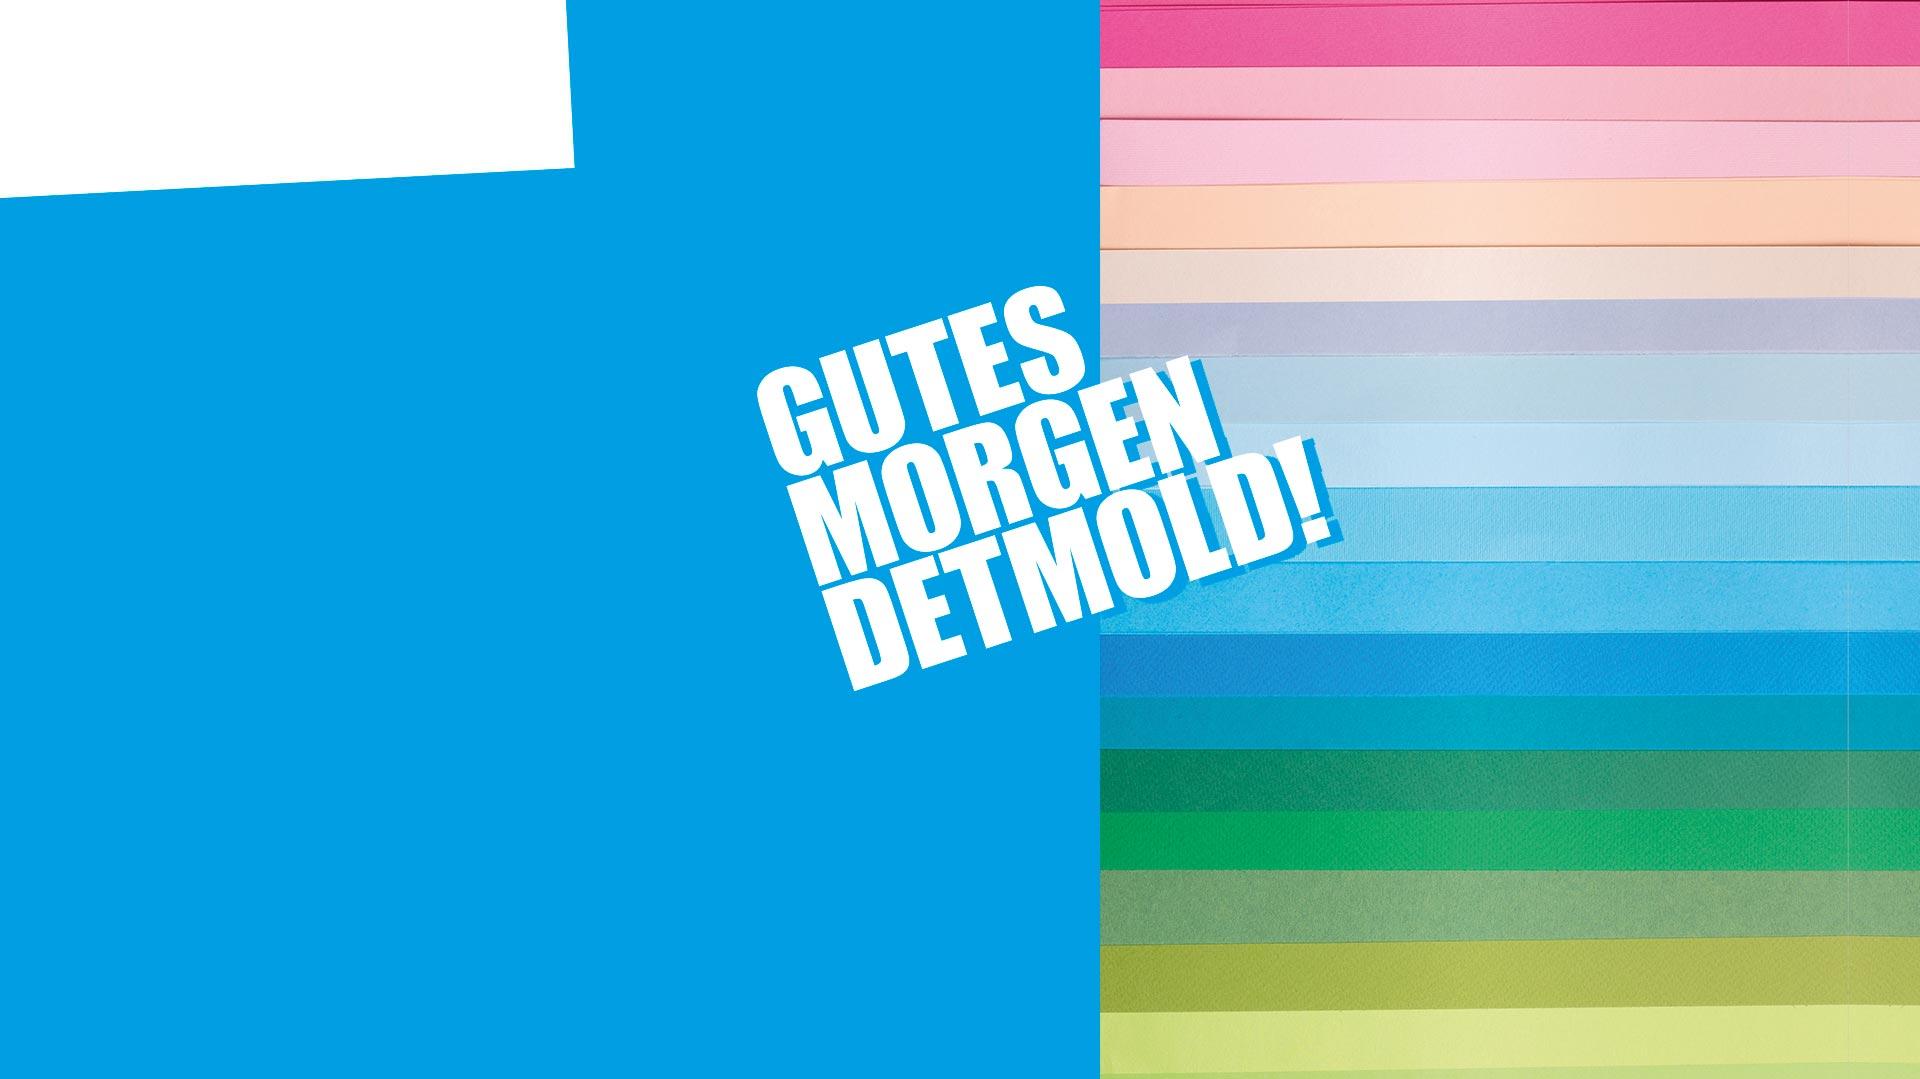 B-WUSST Blende Start -Gutes MorgenDetmold 2020-